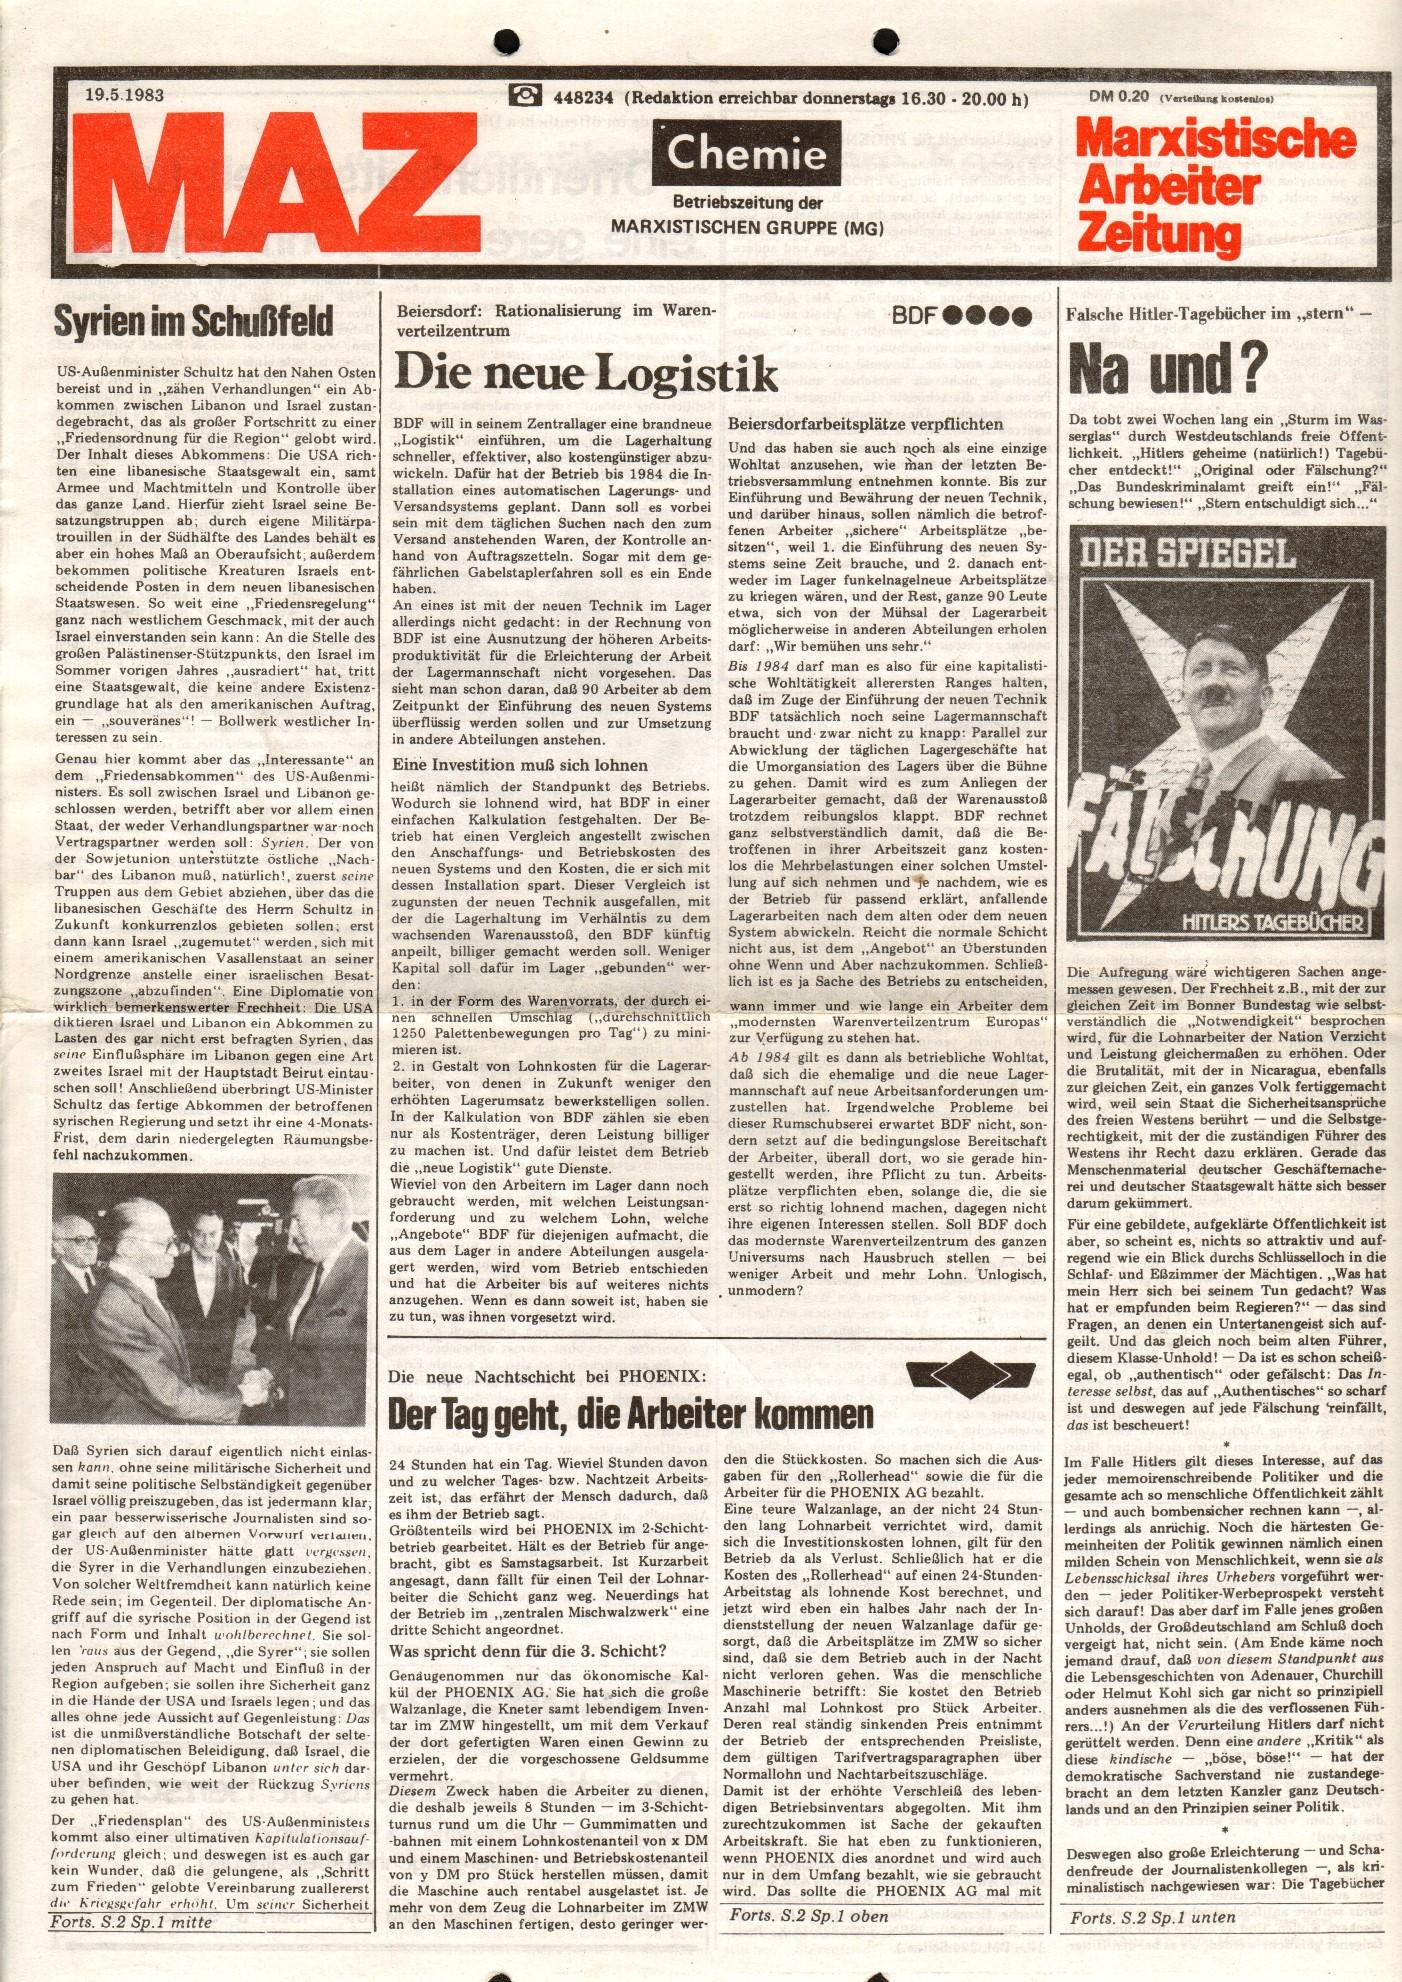 Hamburg_MG_MAZ_Chemie_19830519_01